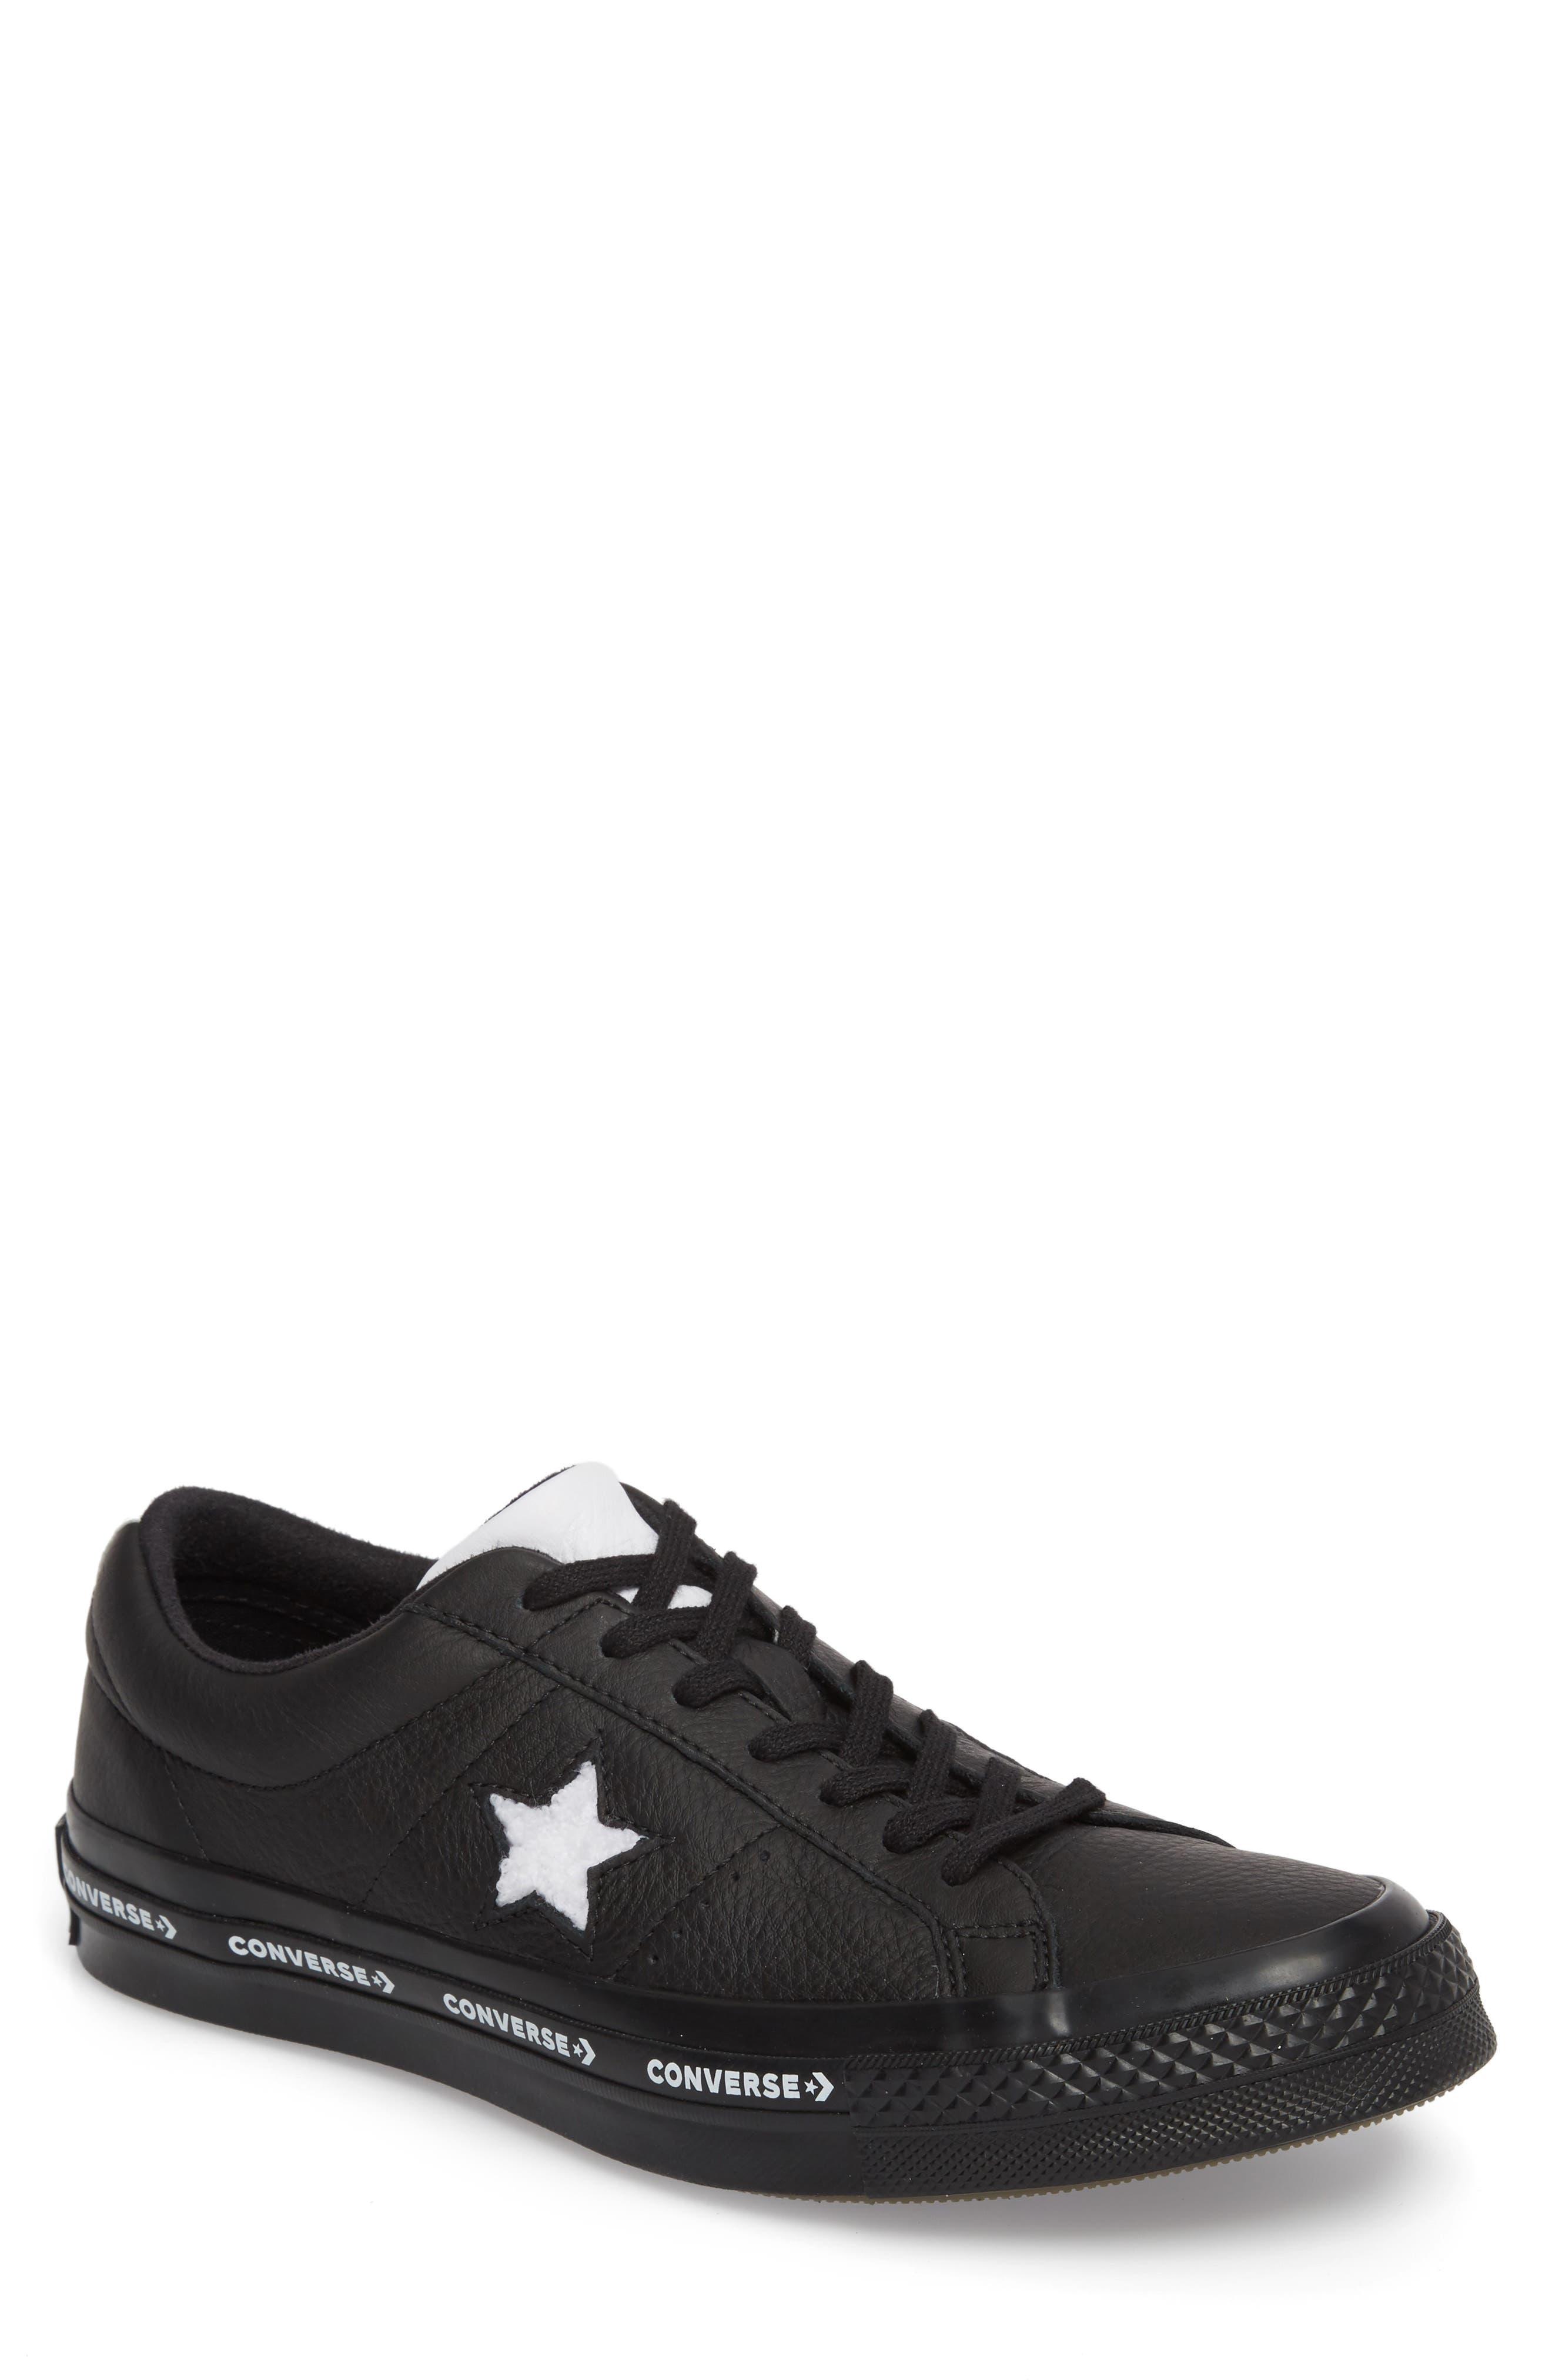 Chuck Taylor<sup>®</sup> One Star Pinstripe Sneaker,                             Main thumbnail 1, color,                             001